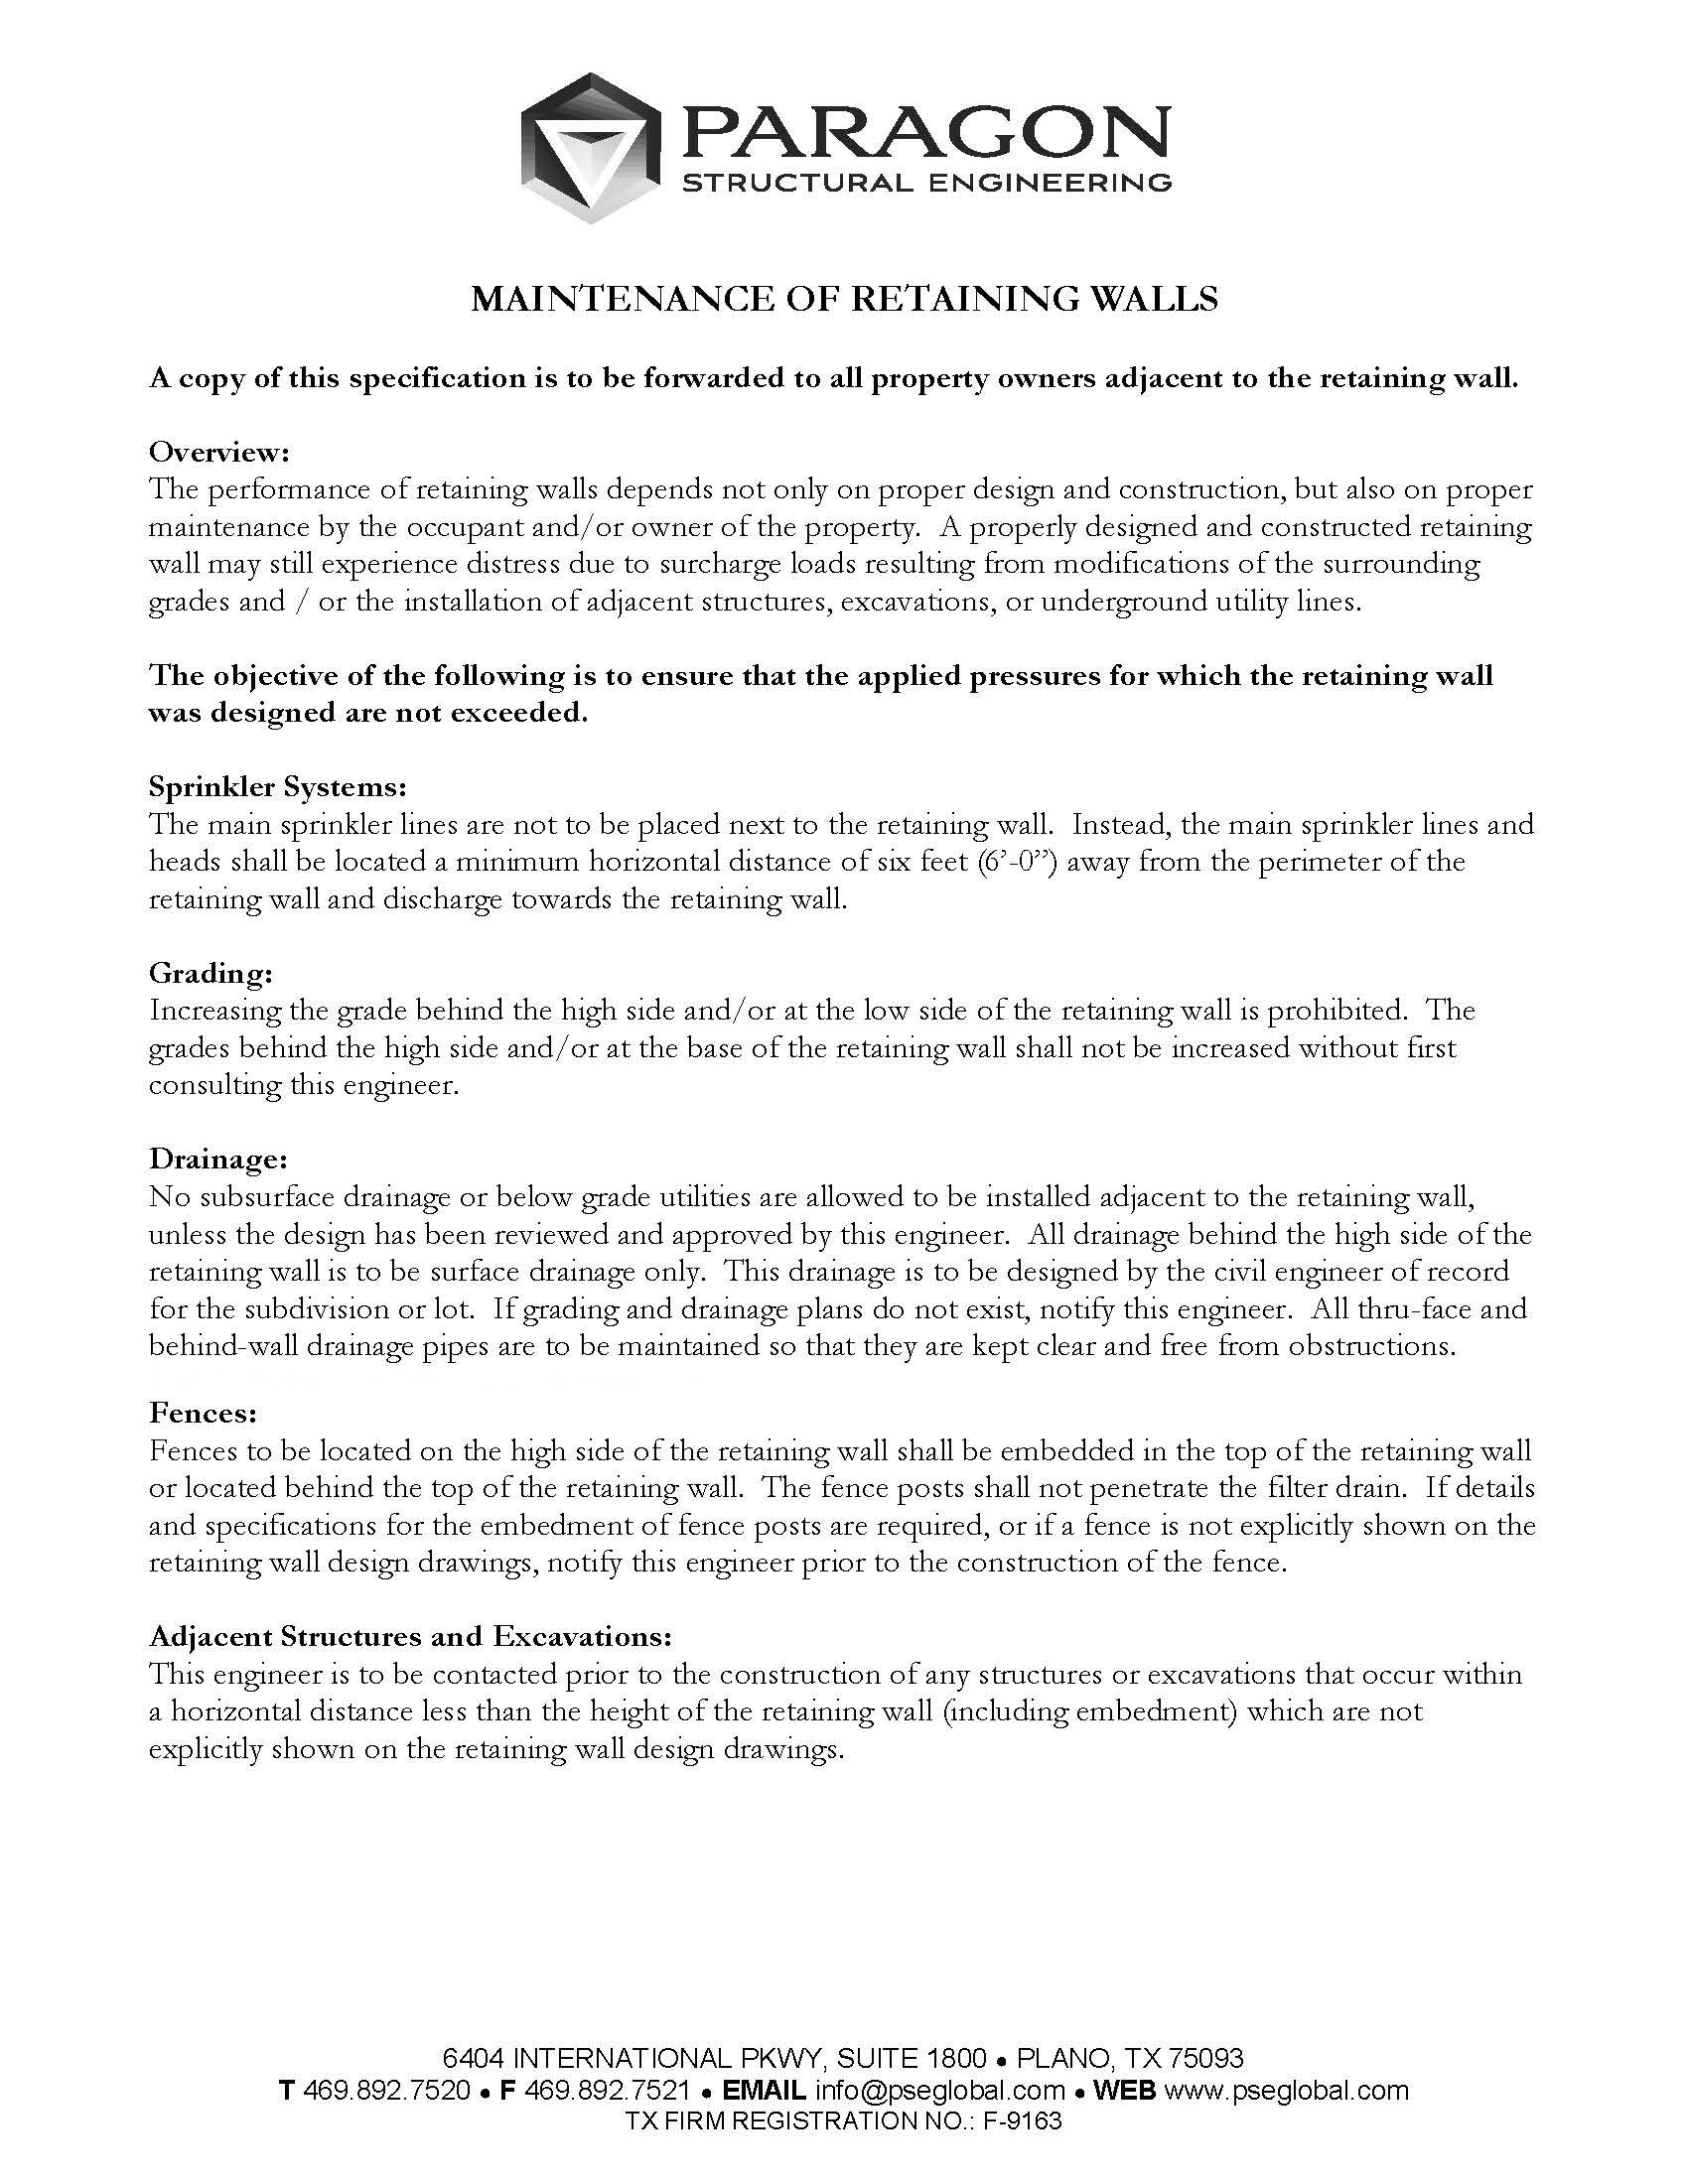 maintenance retaining walls